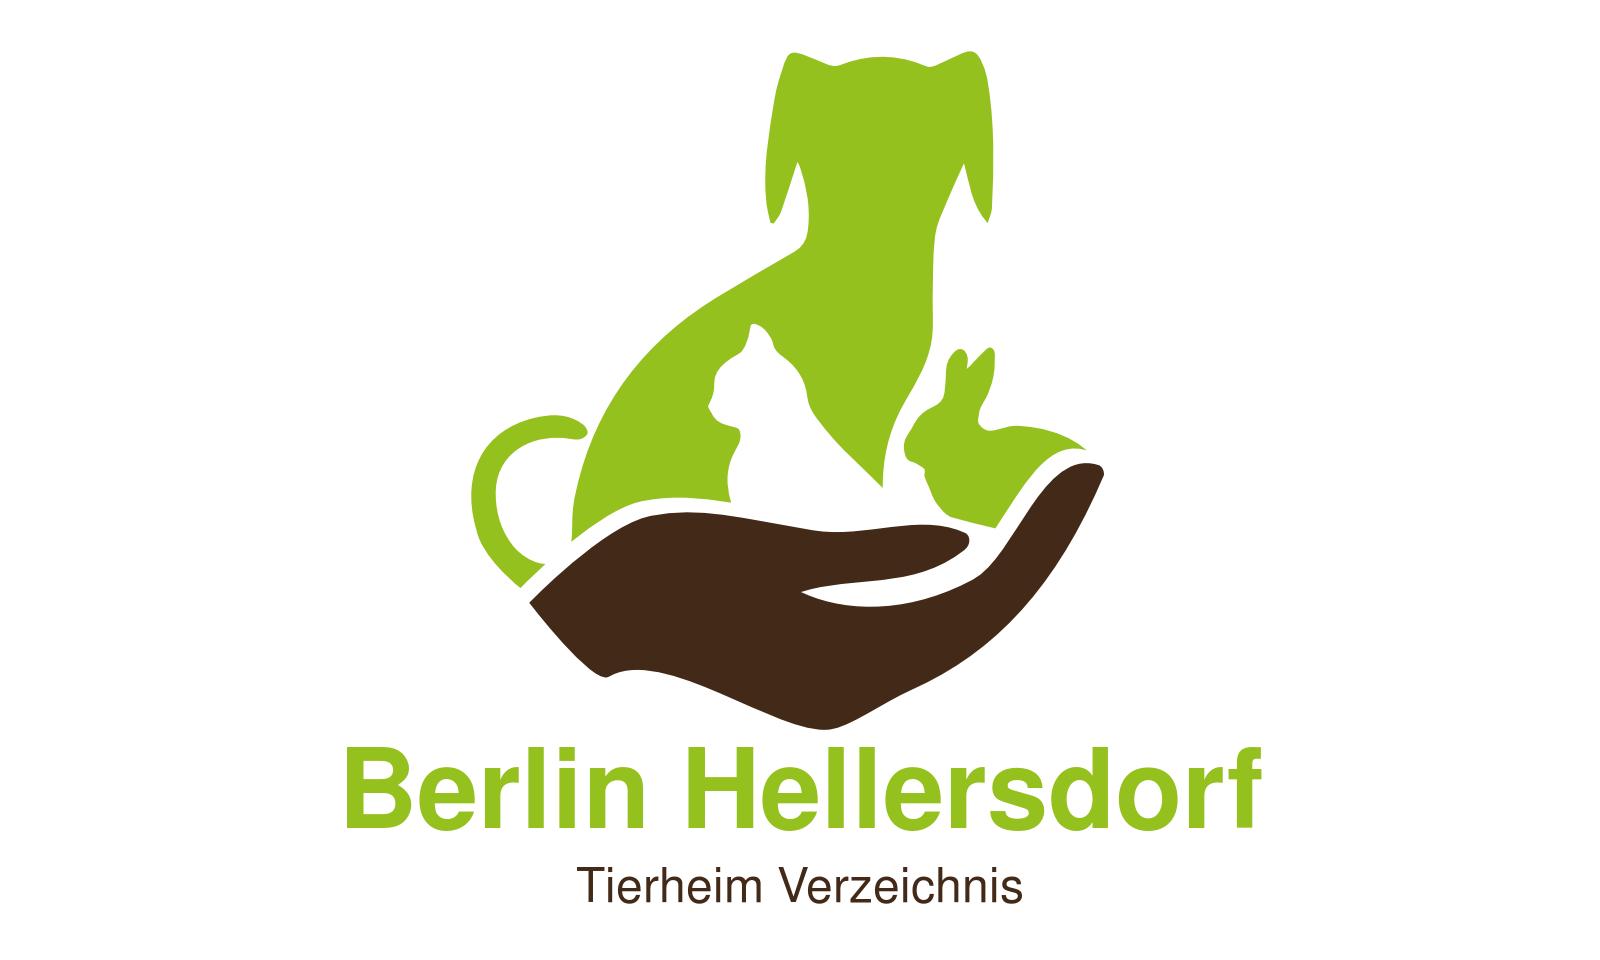 Tierheim Berlin Hellersdorf